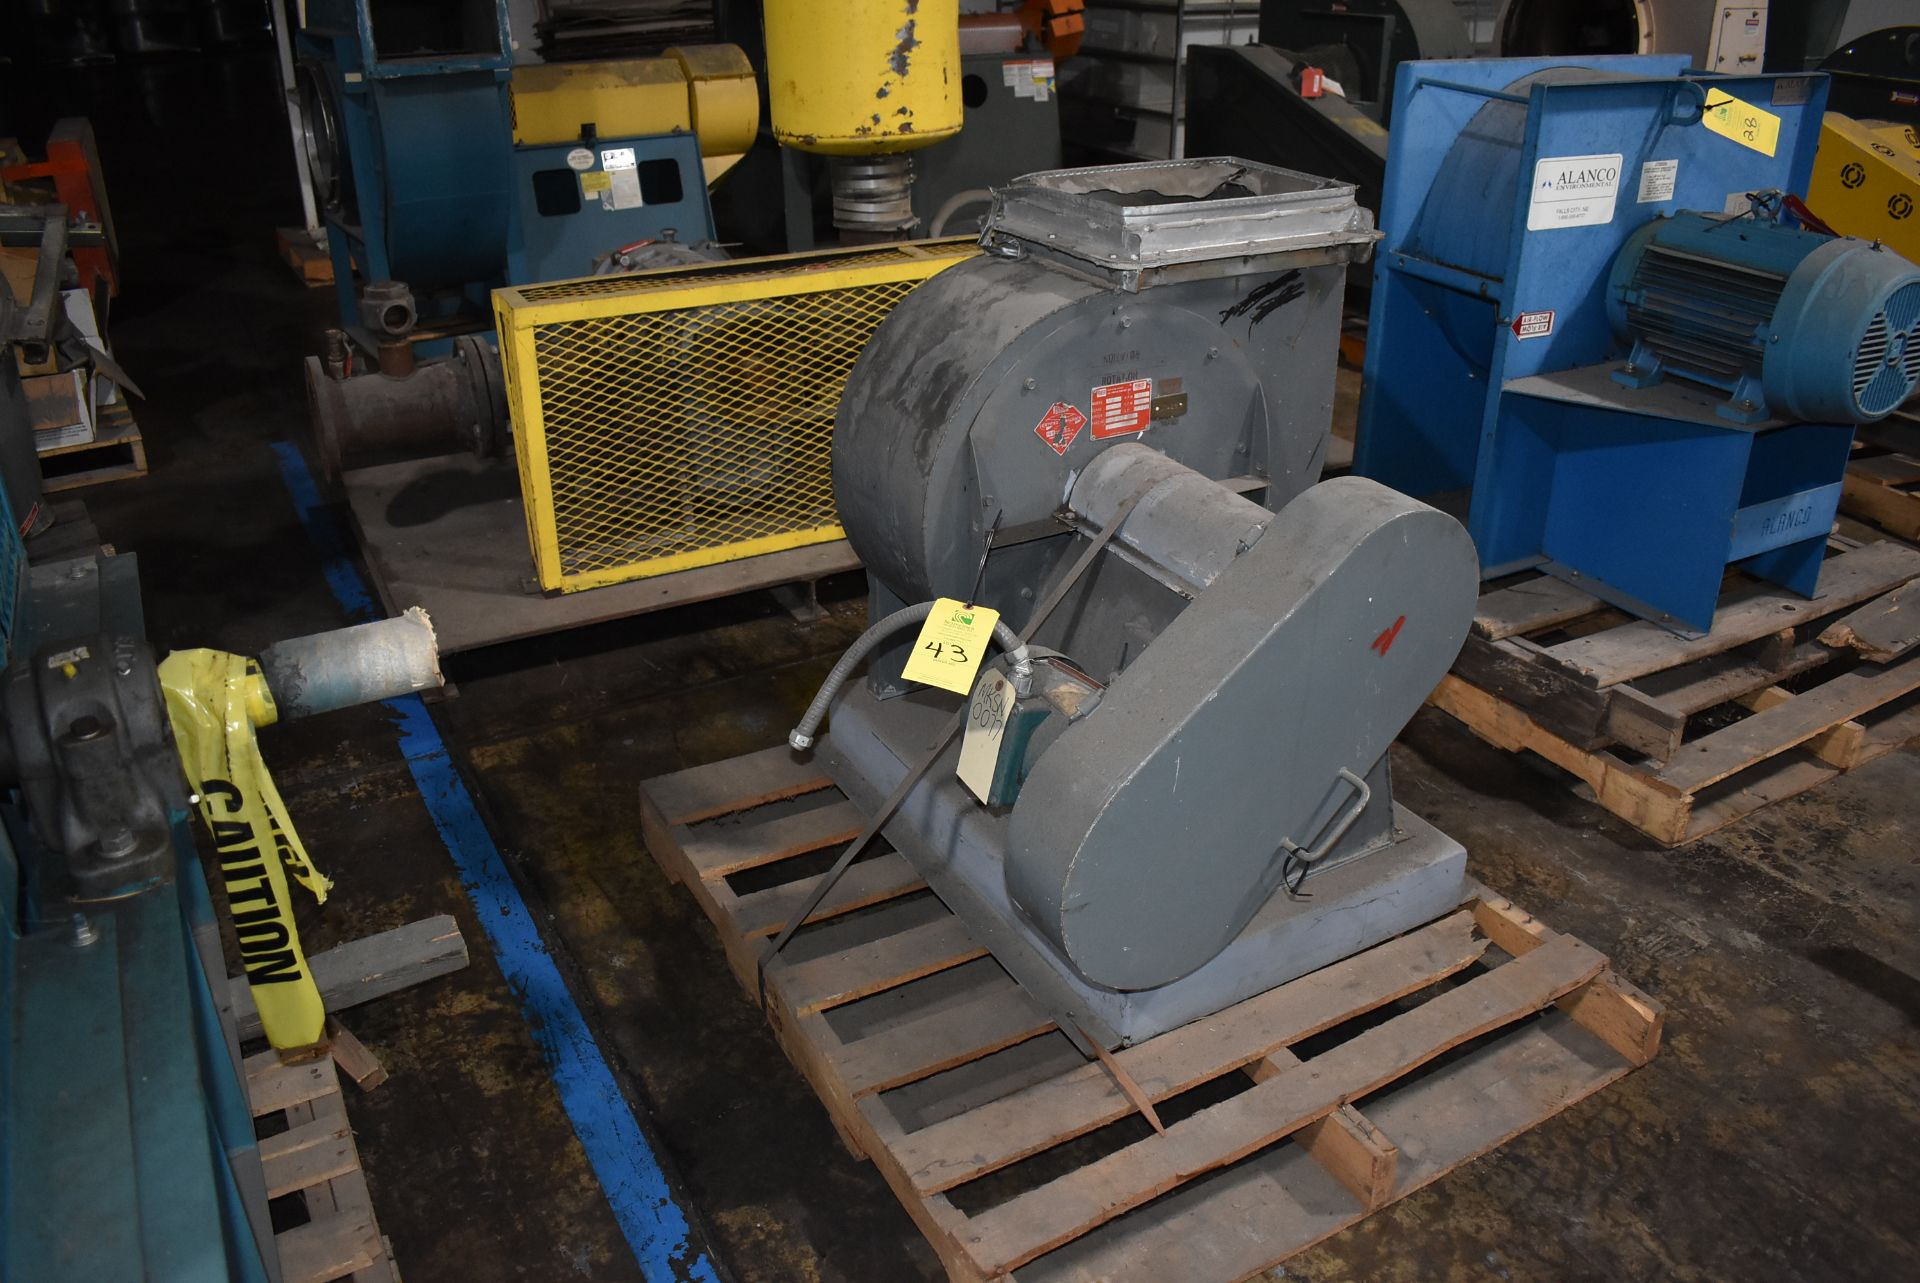 Porter/Peerless Model #150 Blower, Rated 2180 CFM w/2 HP Motor